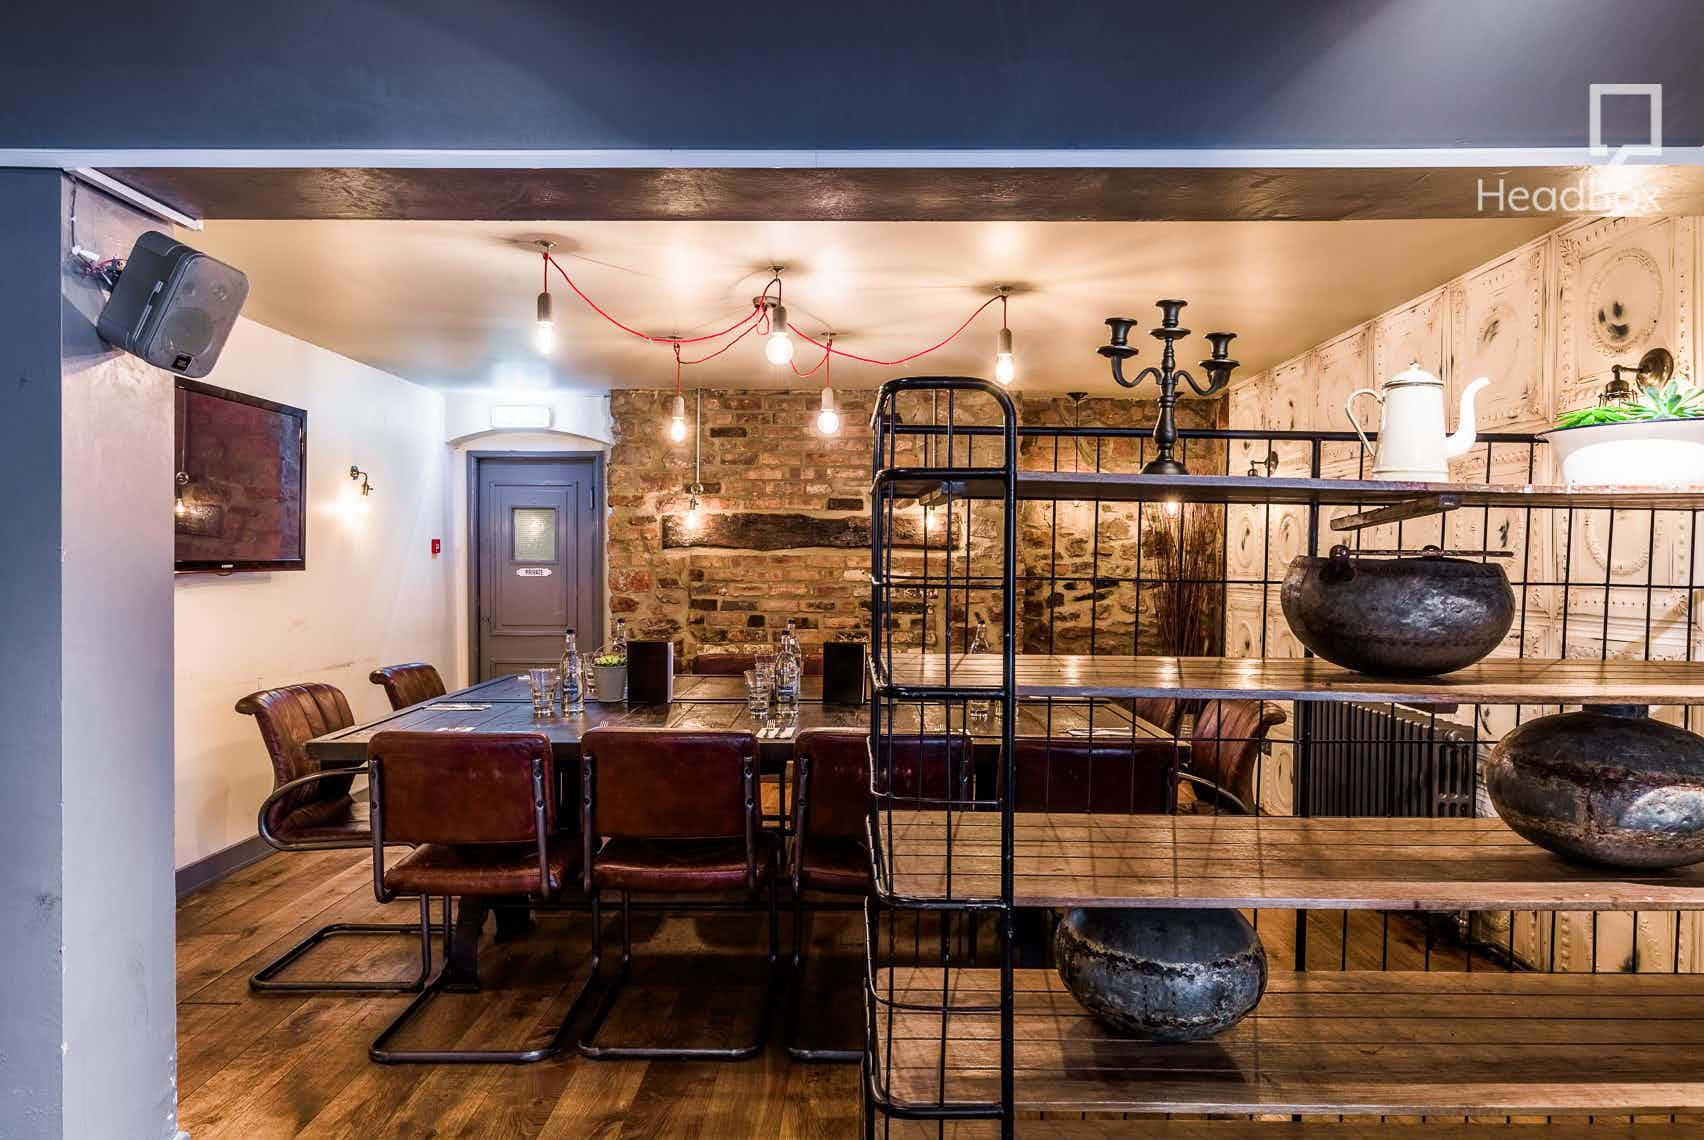 Top Table, Racks Bar & Kitchen